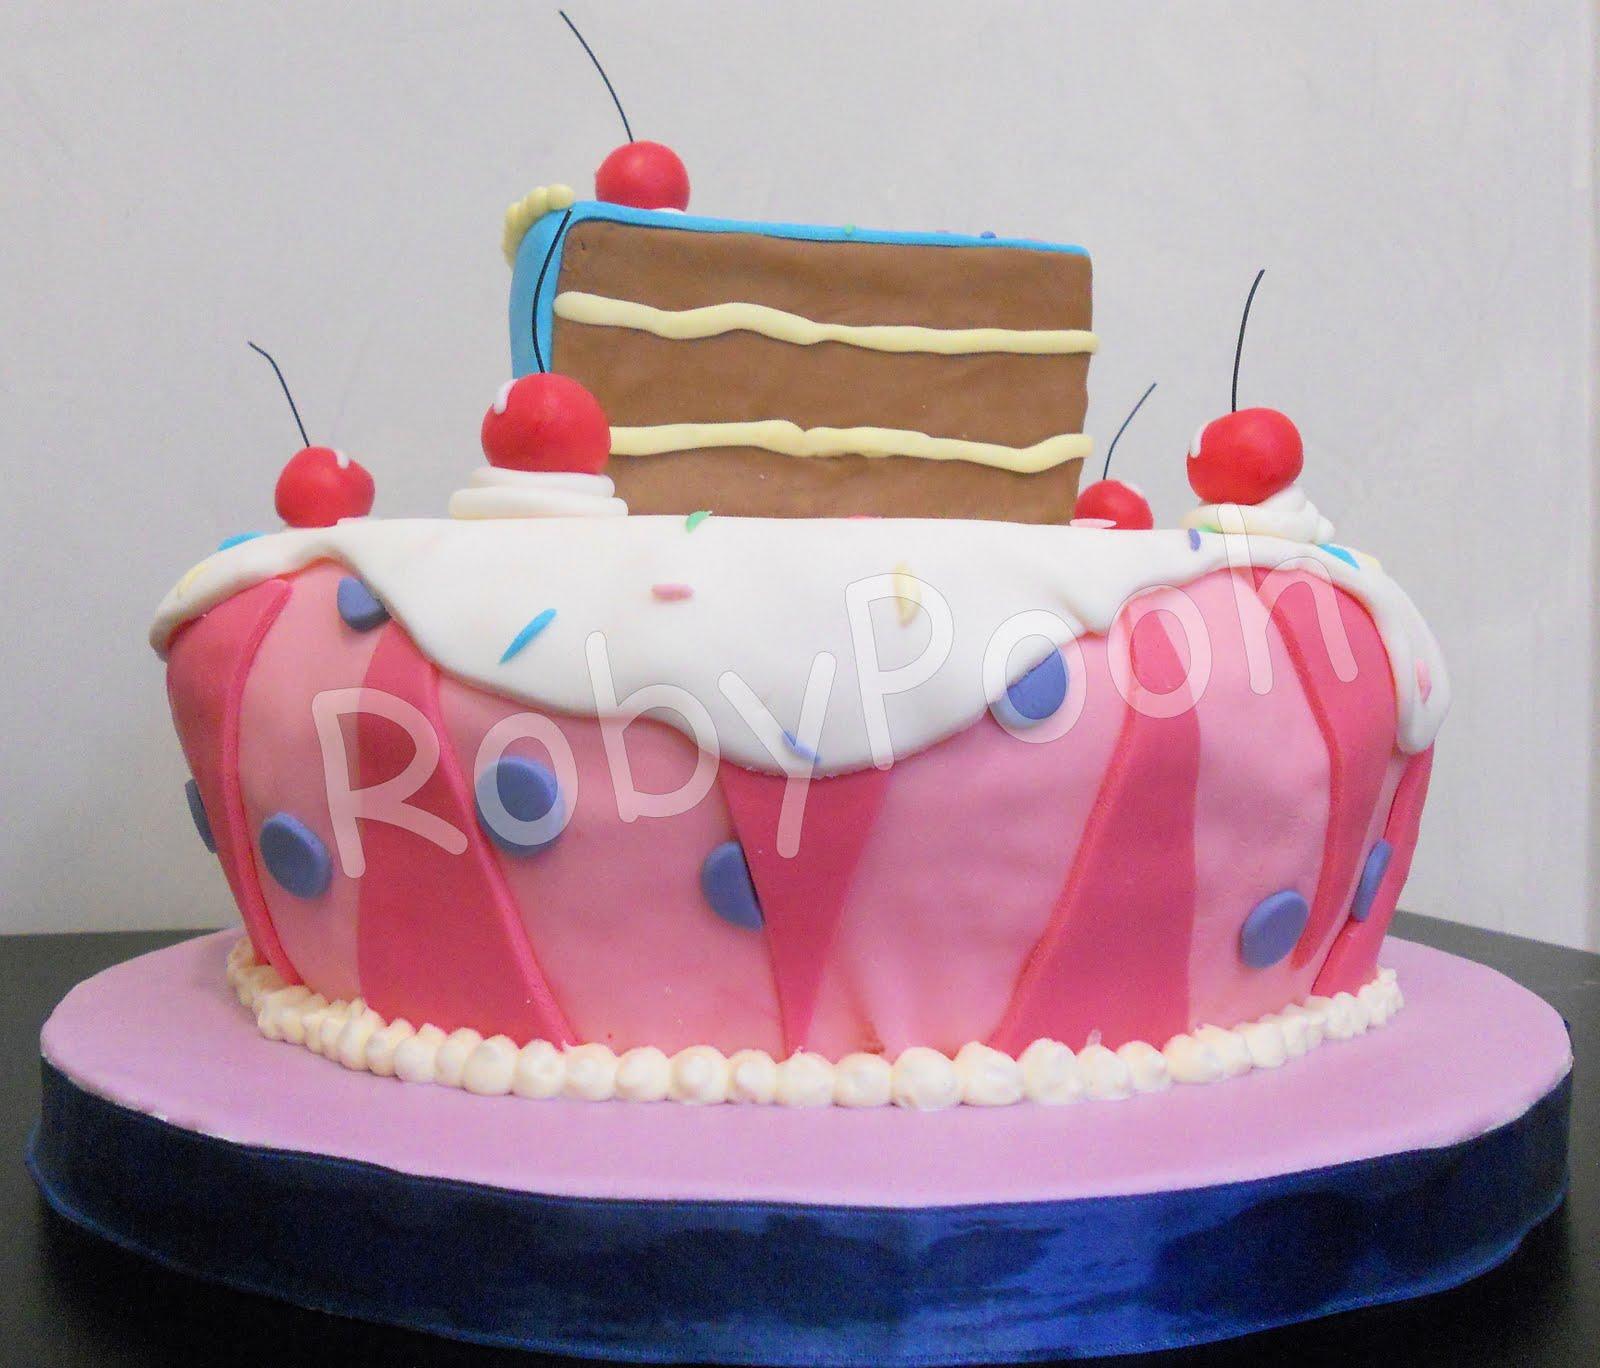 Cake Design Via Volta Milano : Dolci&Delizie: Torte presentate al Cake design Italian ...